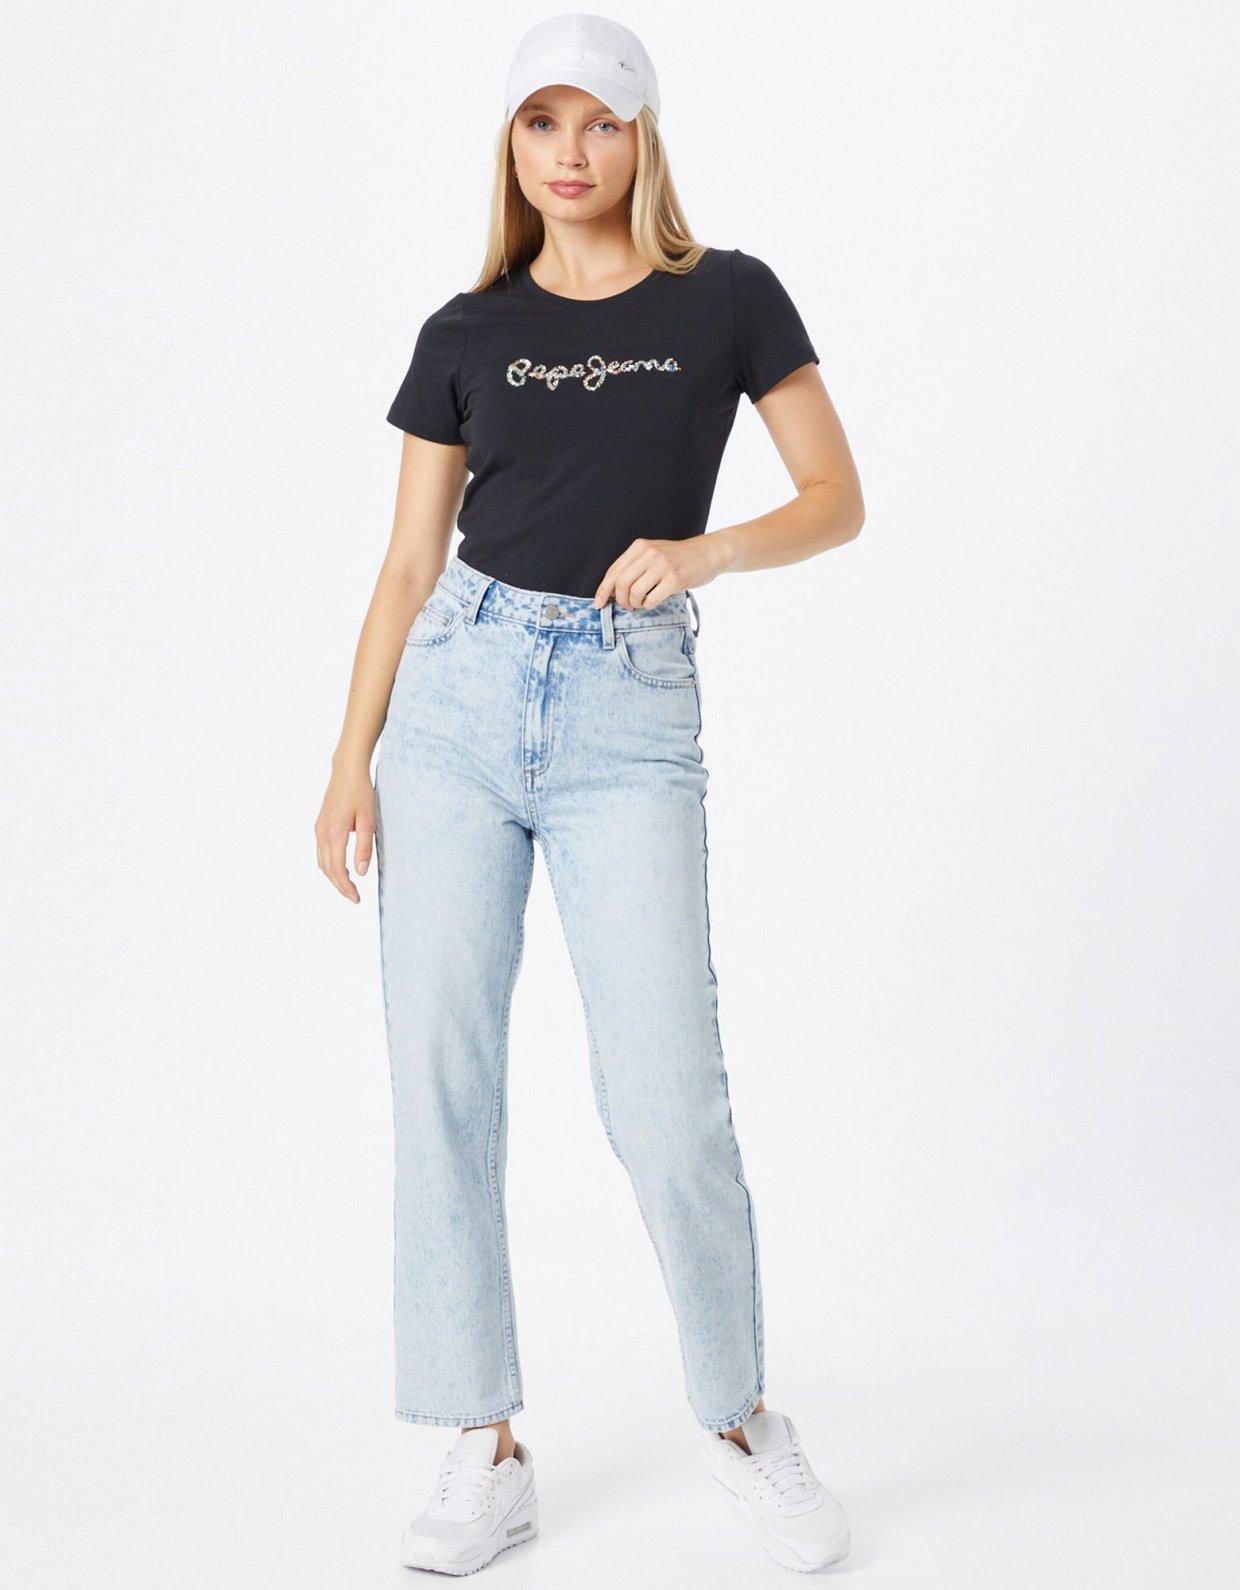 Pepe Jeans Dorita strass t-shirt black